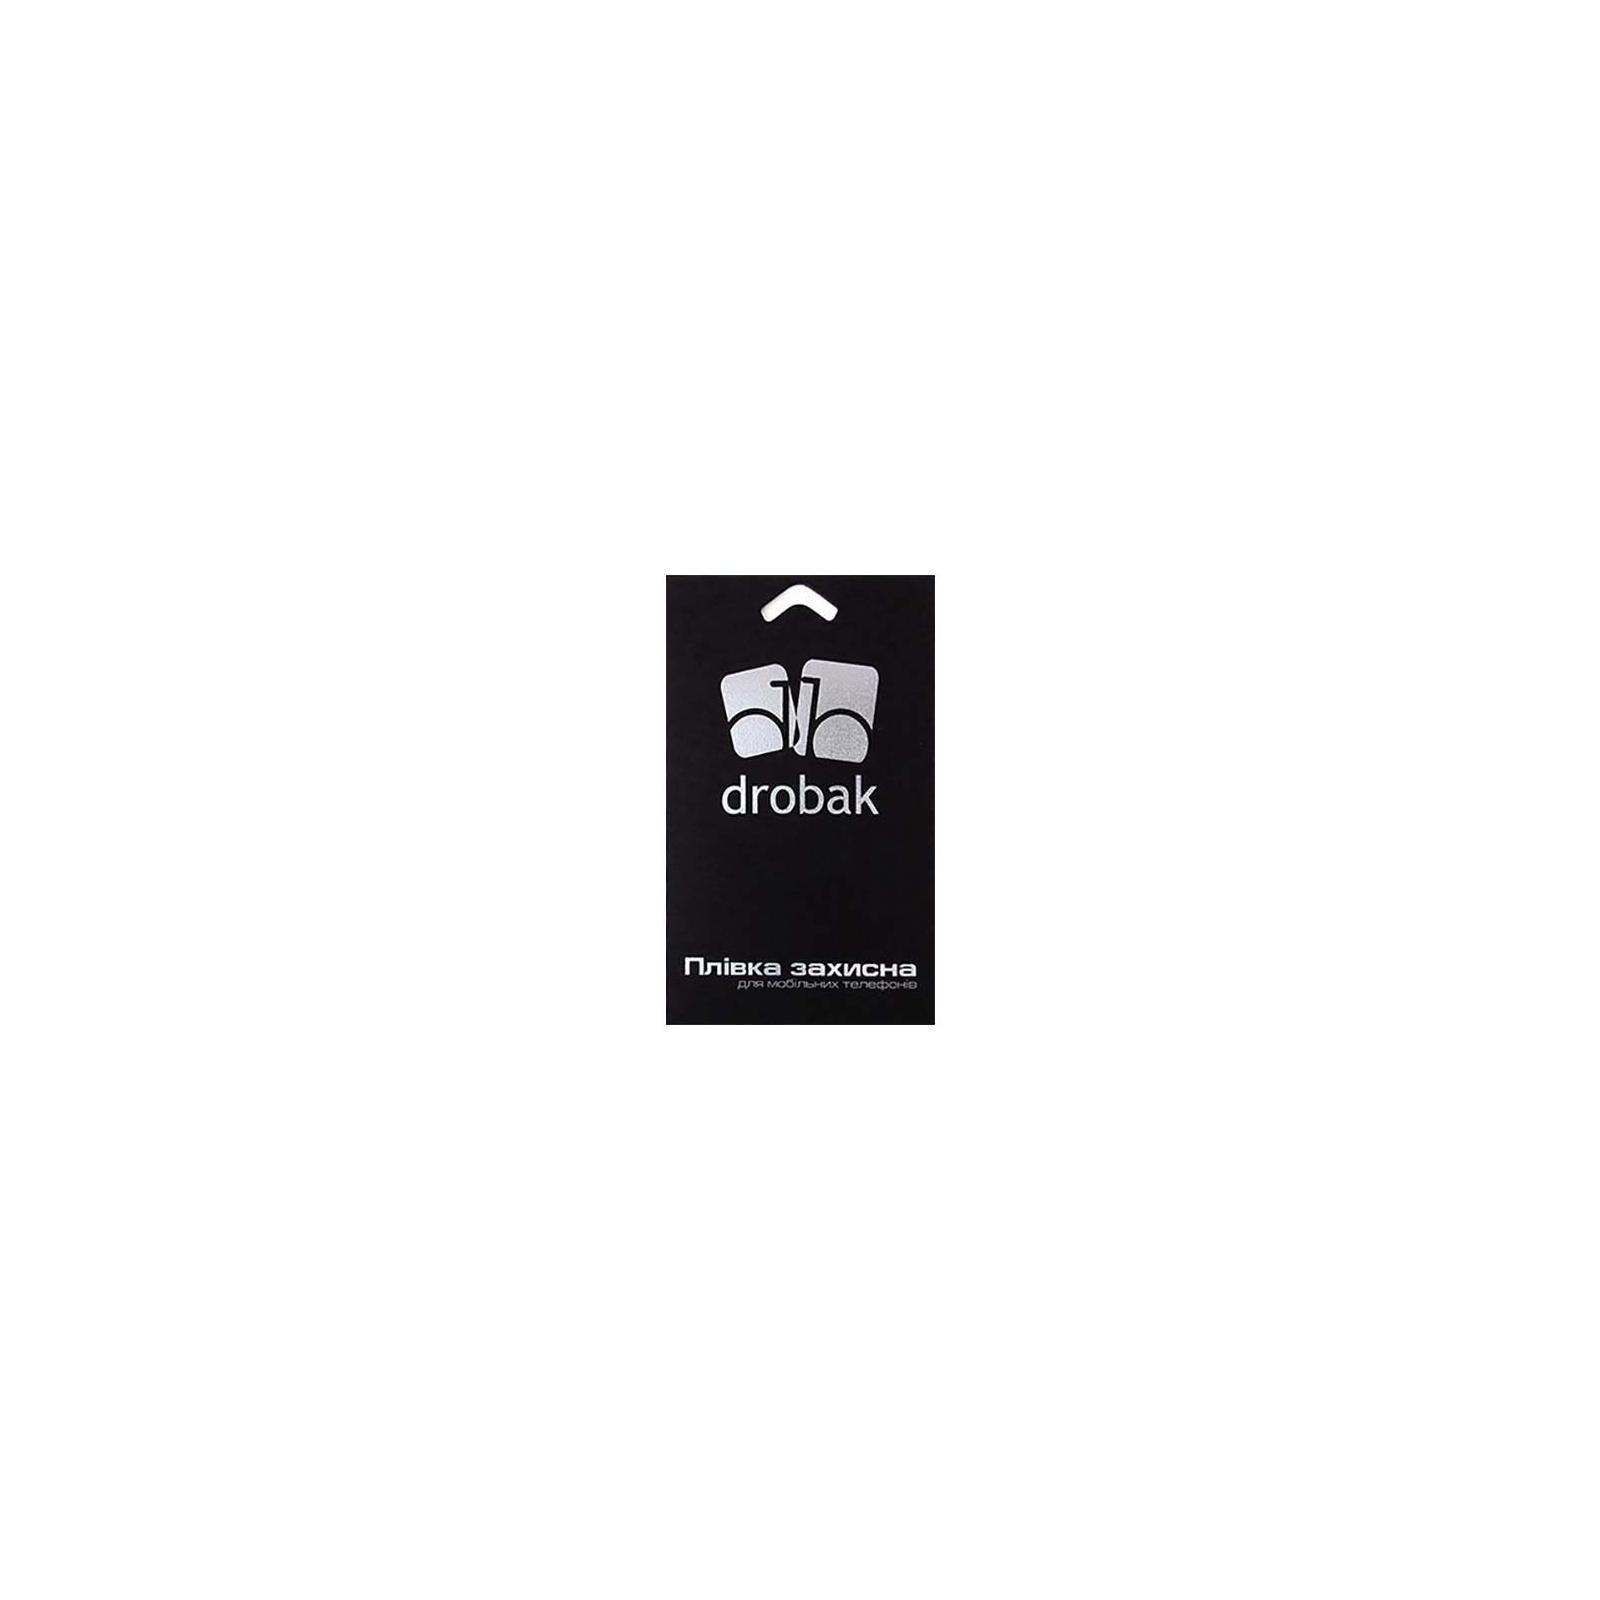 Пленка защитная Drobak для Nokia Lumia 1020 (505106)